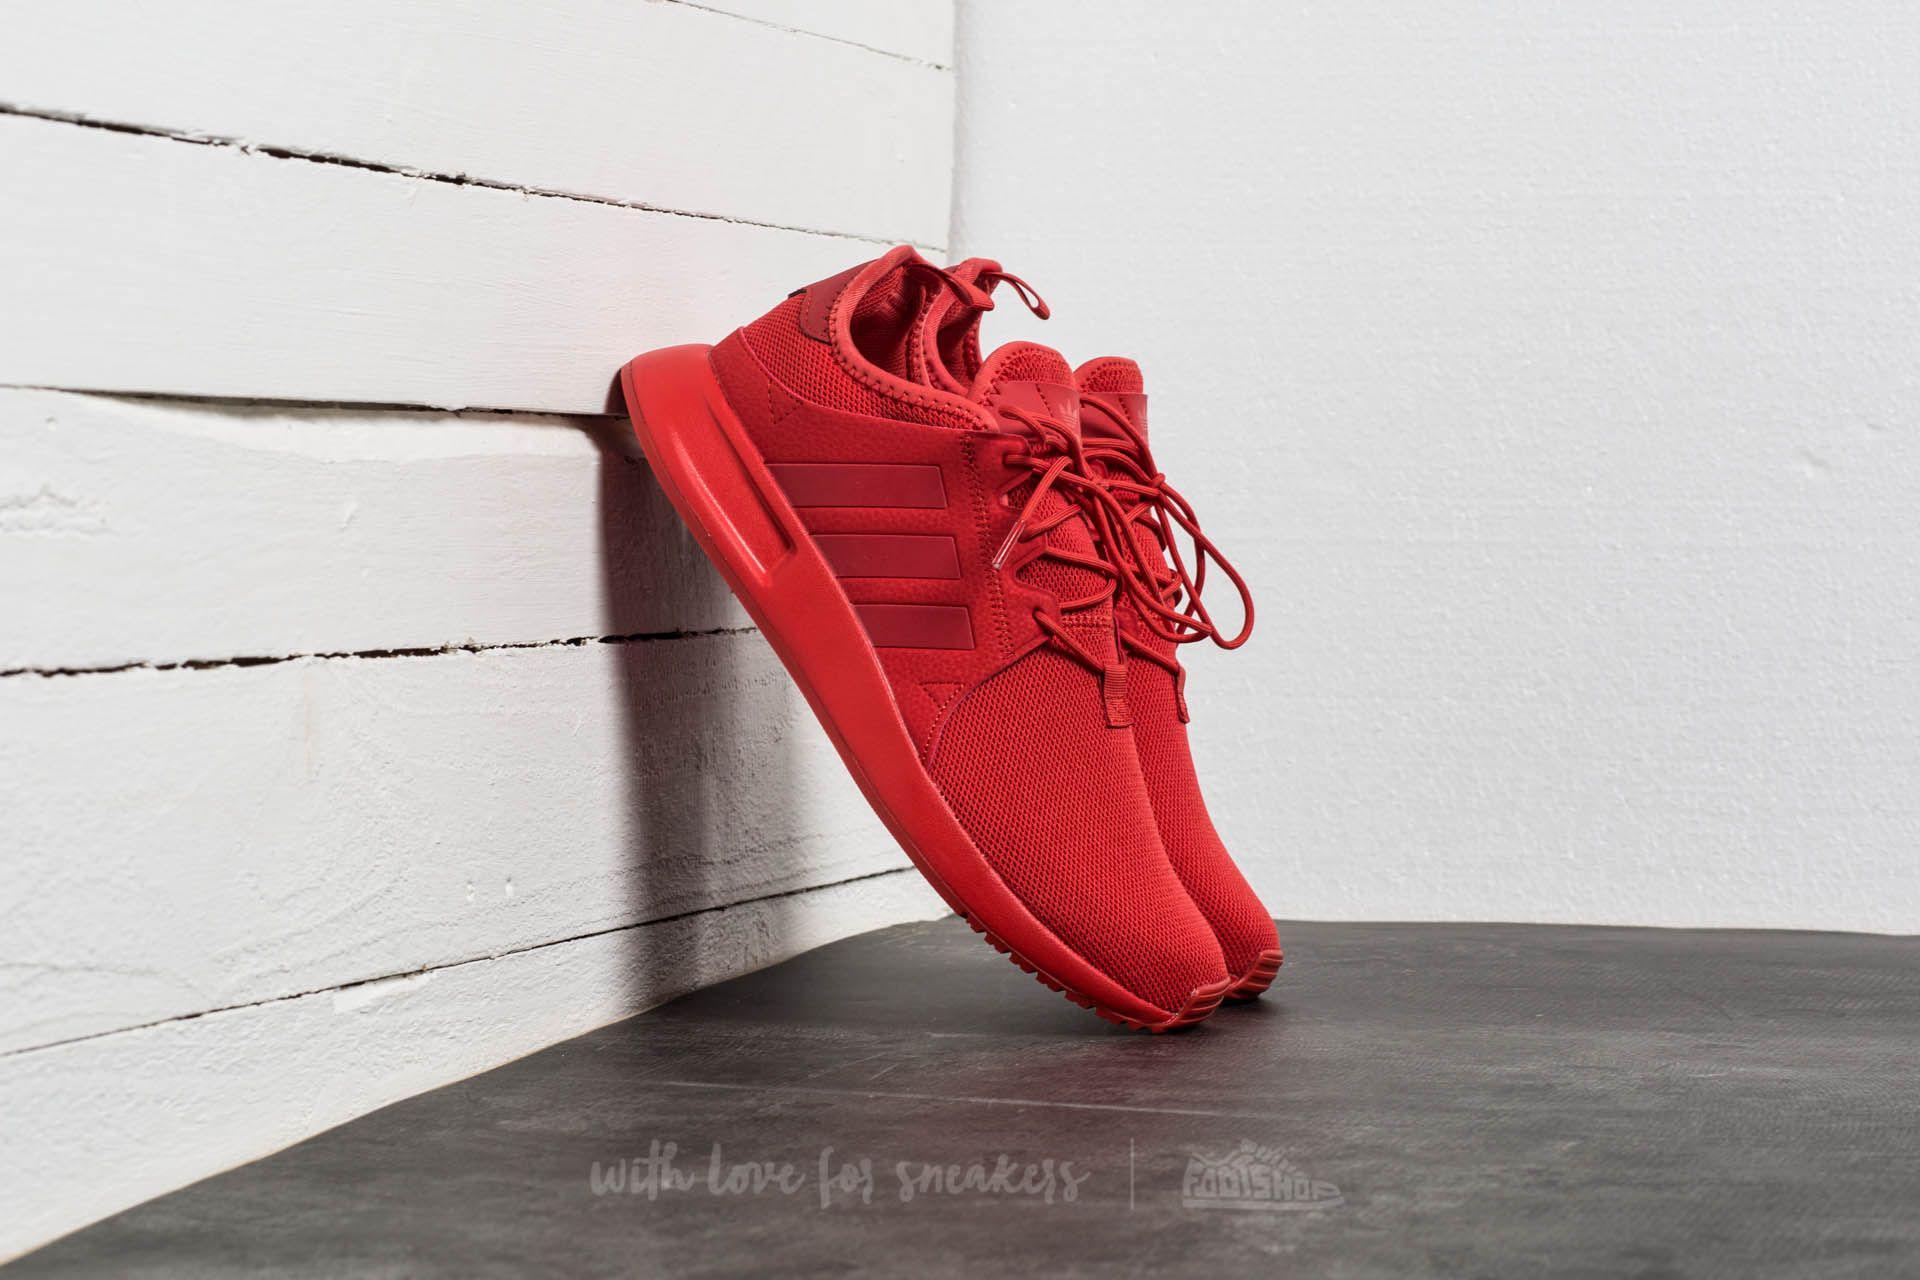 detailed look 6aad6 efe85 Lyst Adidas Rojo  Originals Adidas X plr Tactile Rojo  Adidas Trace Gris  Metalic a82fb7